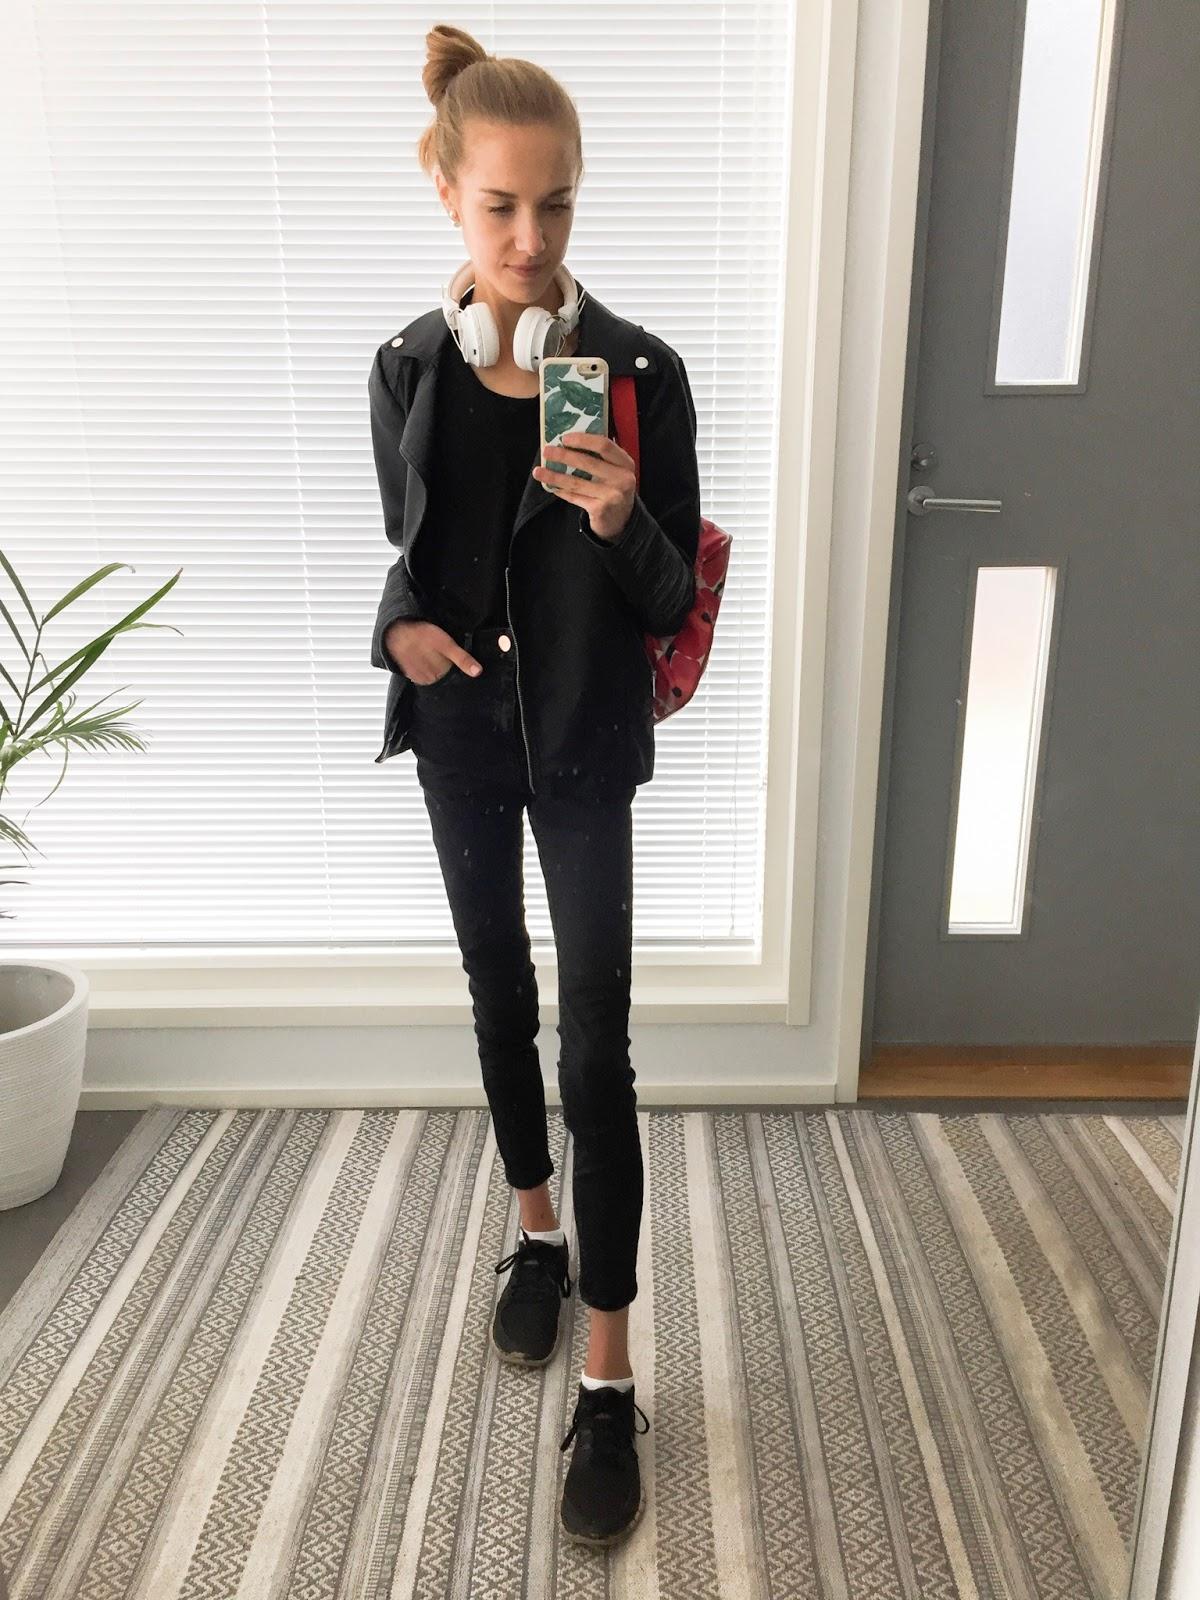 fashion-blogger-real-outfits-all-black-muotibloggaaja-arkiasu-kokomusta